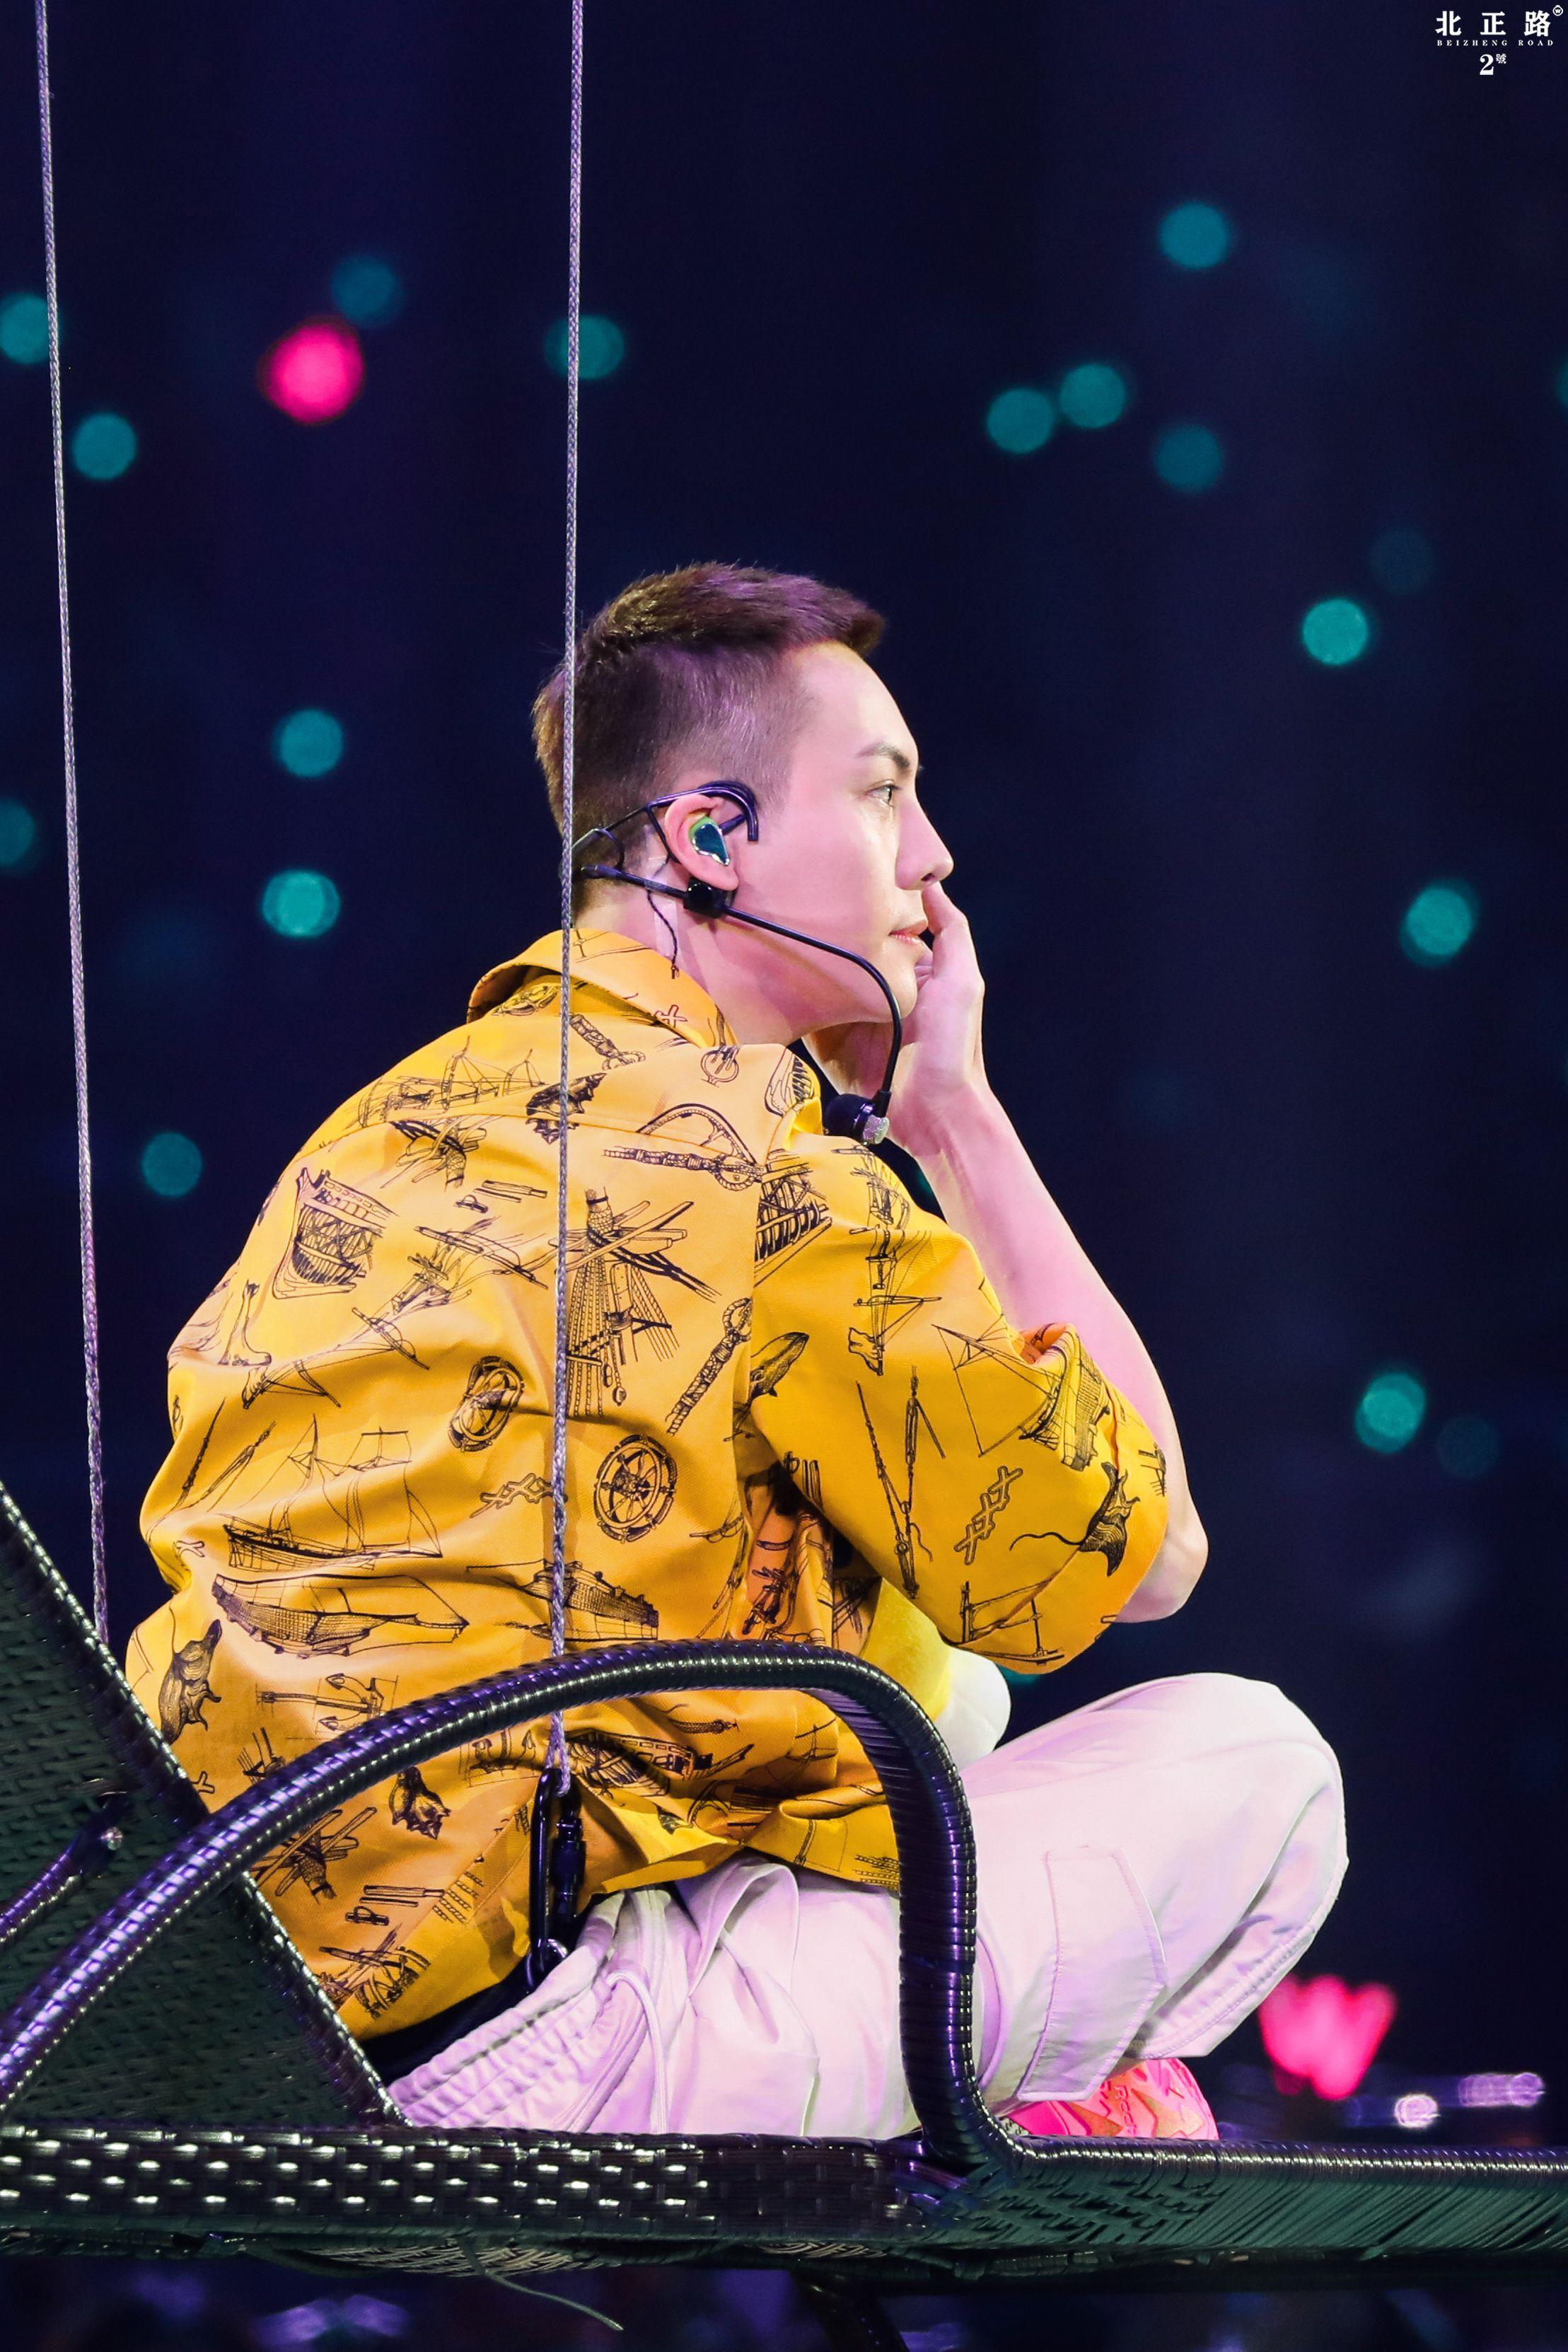 William Chan Fanpics Jiangsu TV New Year's Eve Concert